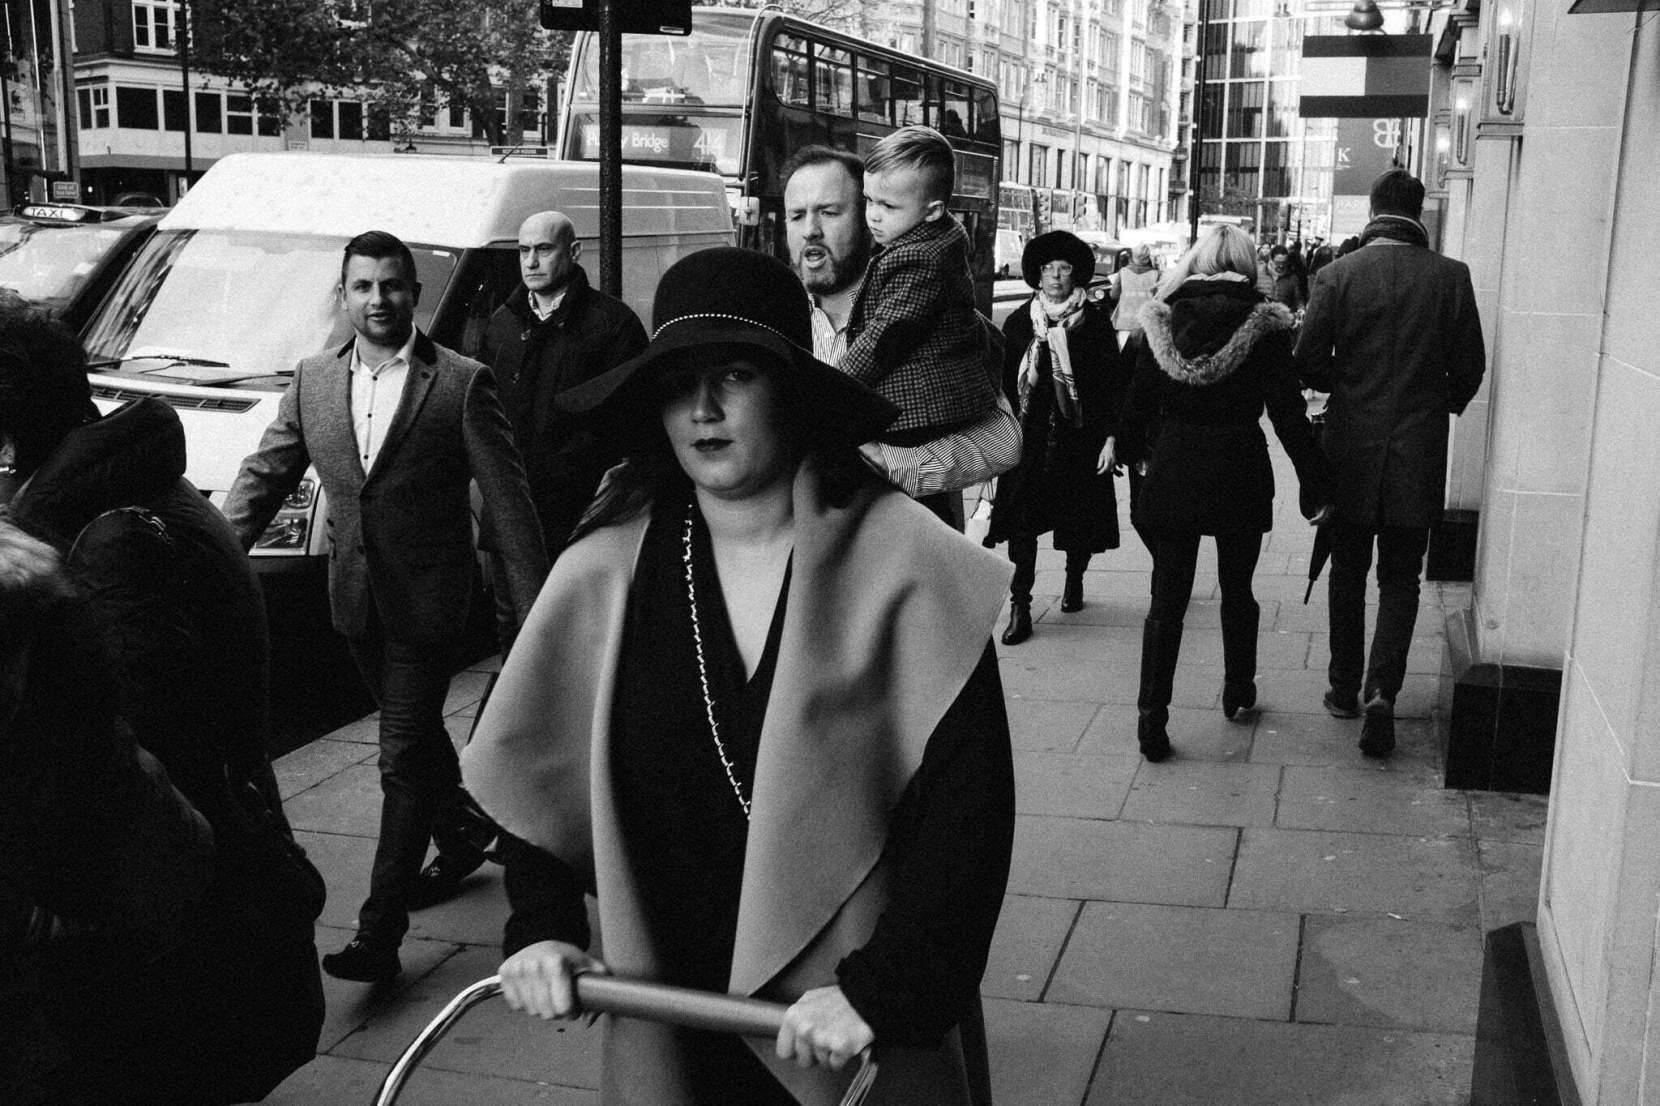 london-street-8022-pete-carr